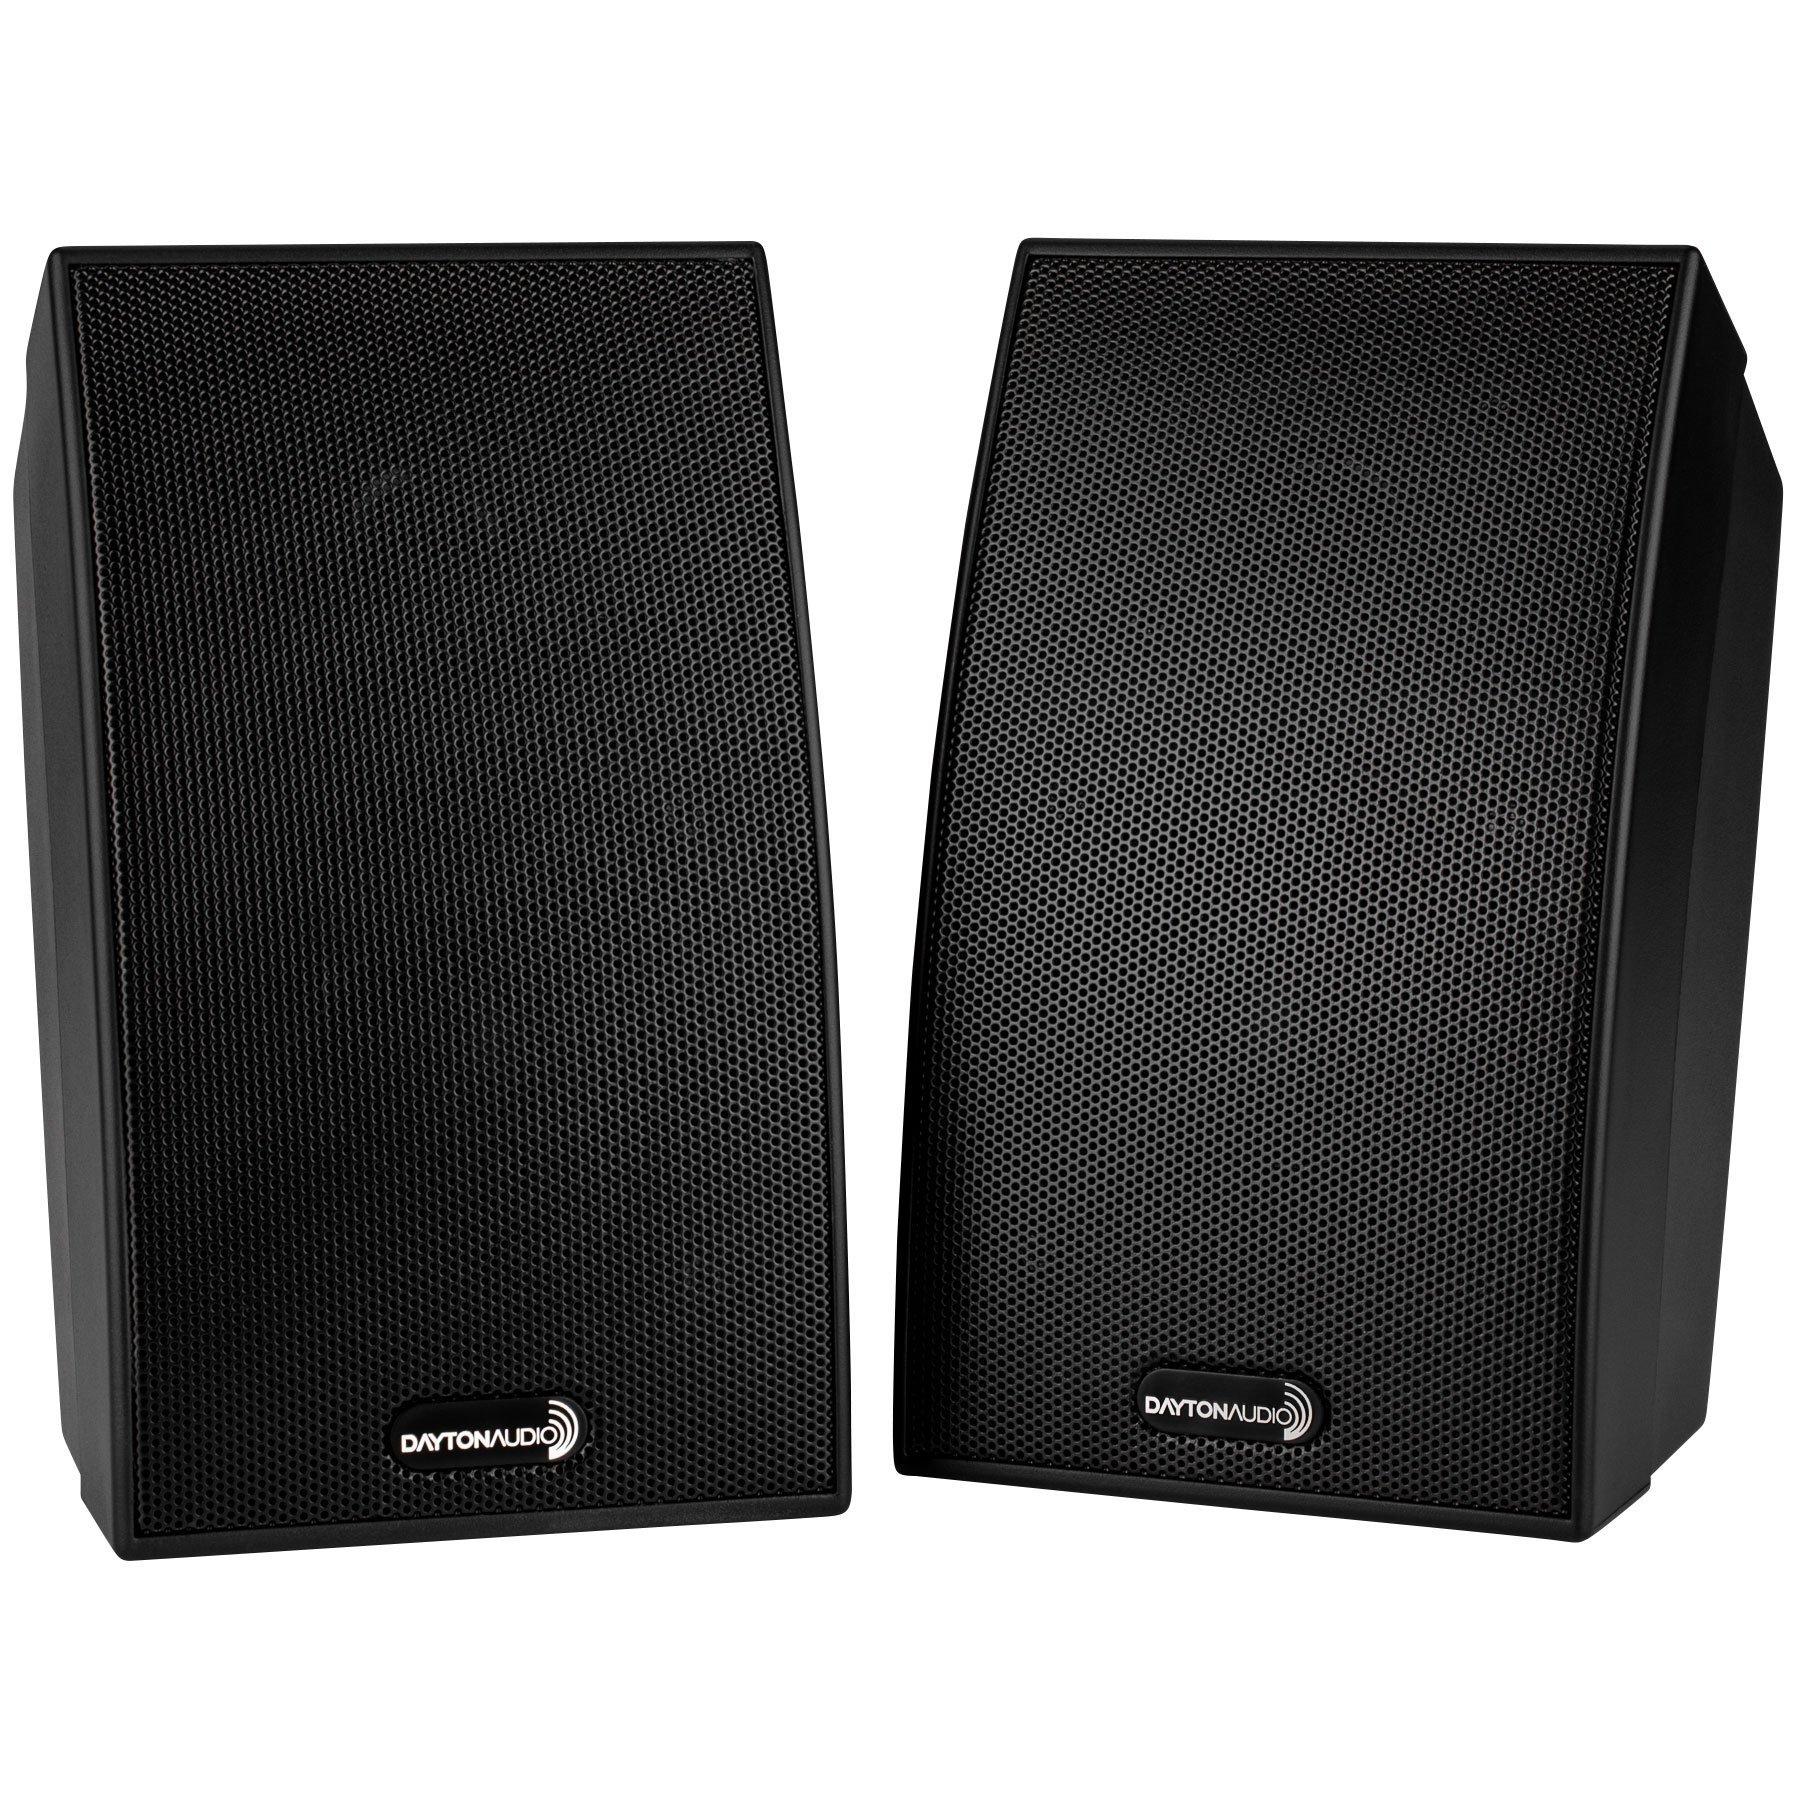 Dayton Audio SAT-BK Satellite Speaker Pair - Black by Dayton Audio